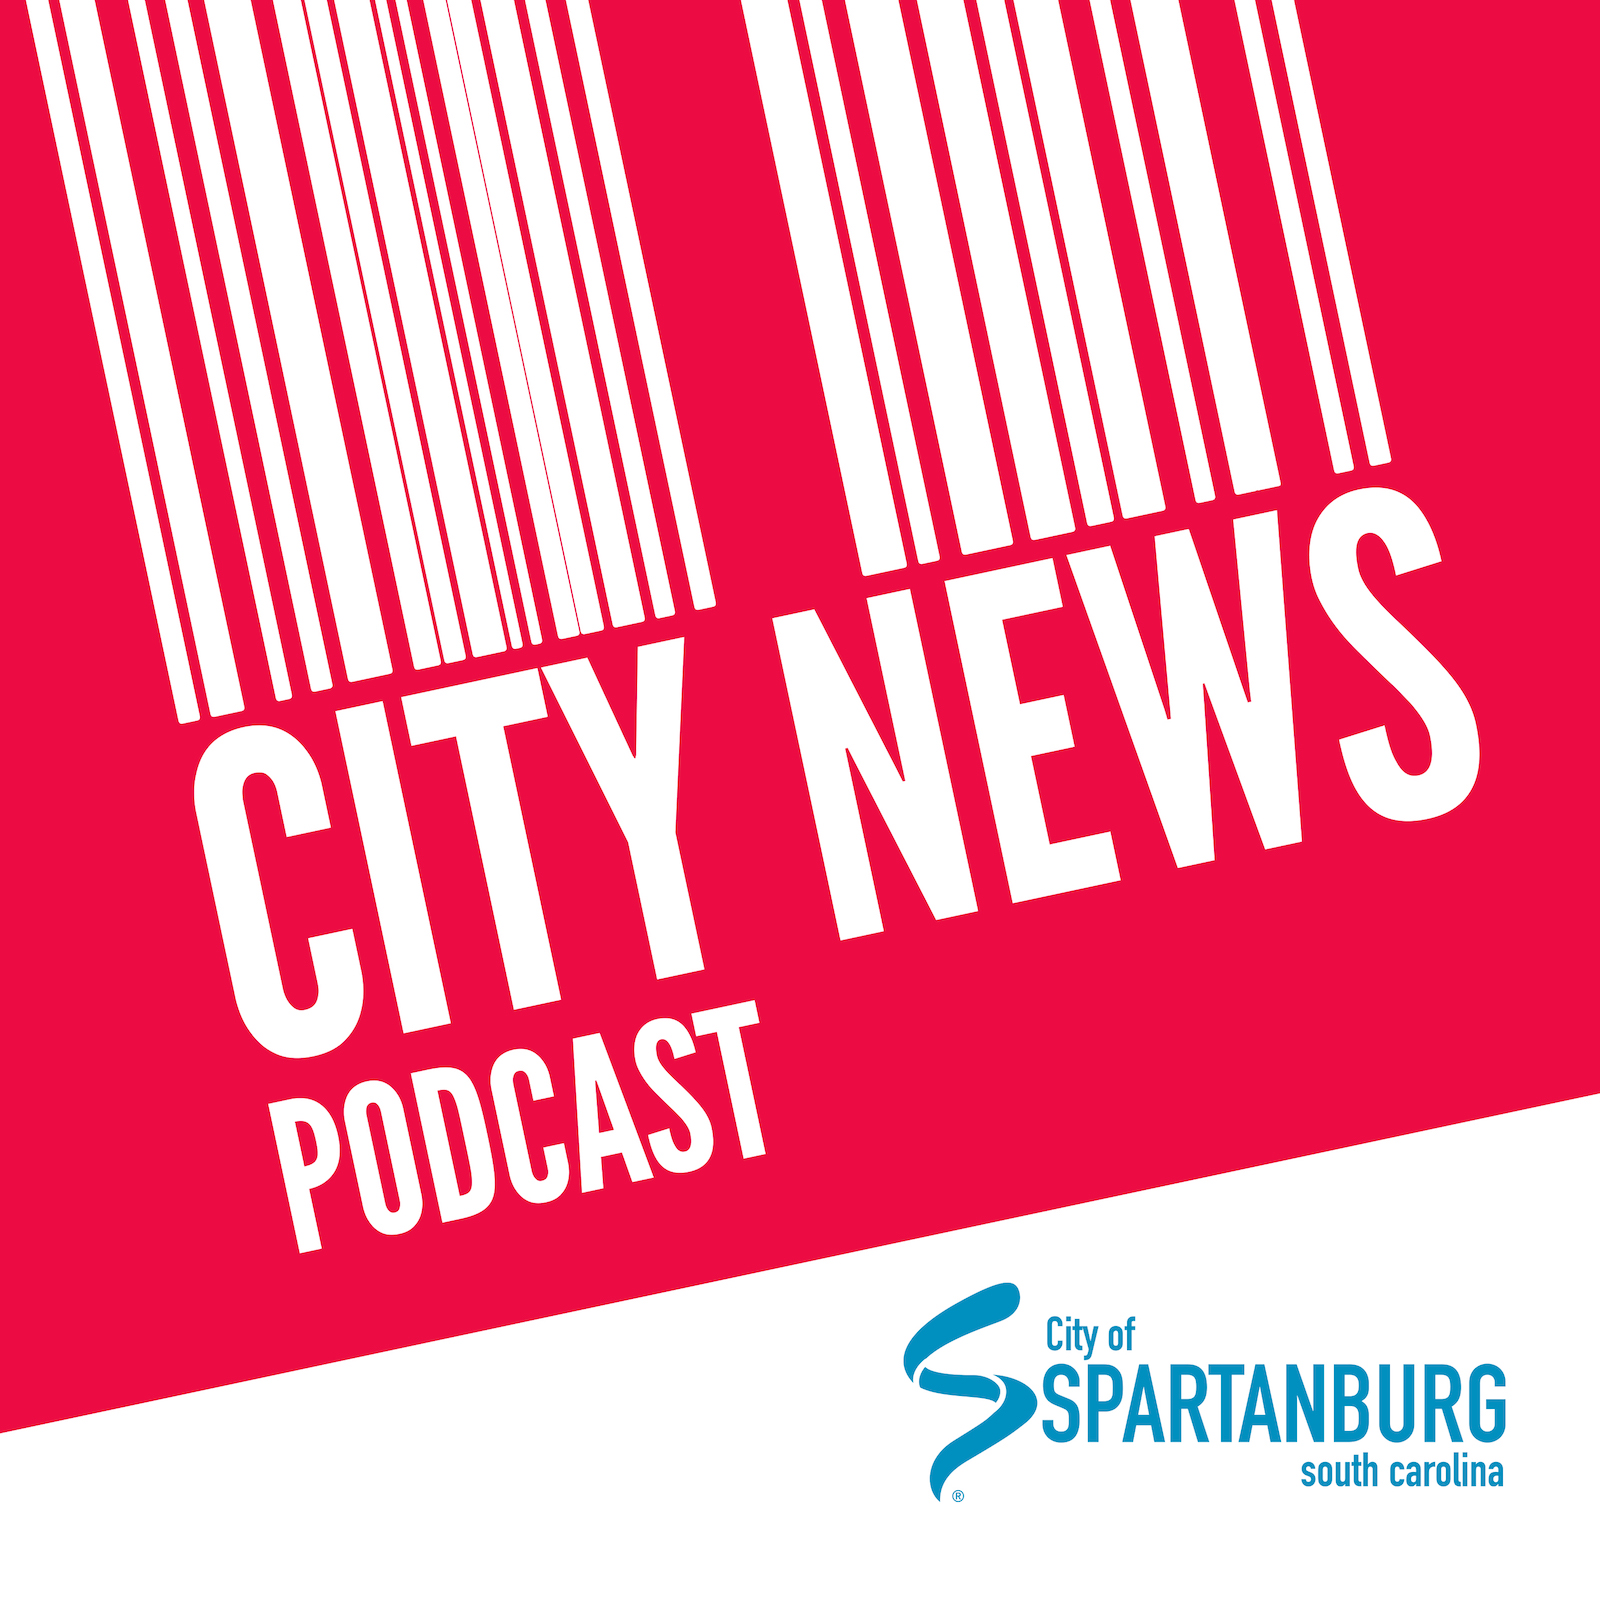 Spartanburg City News Podcast show art